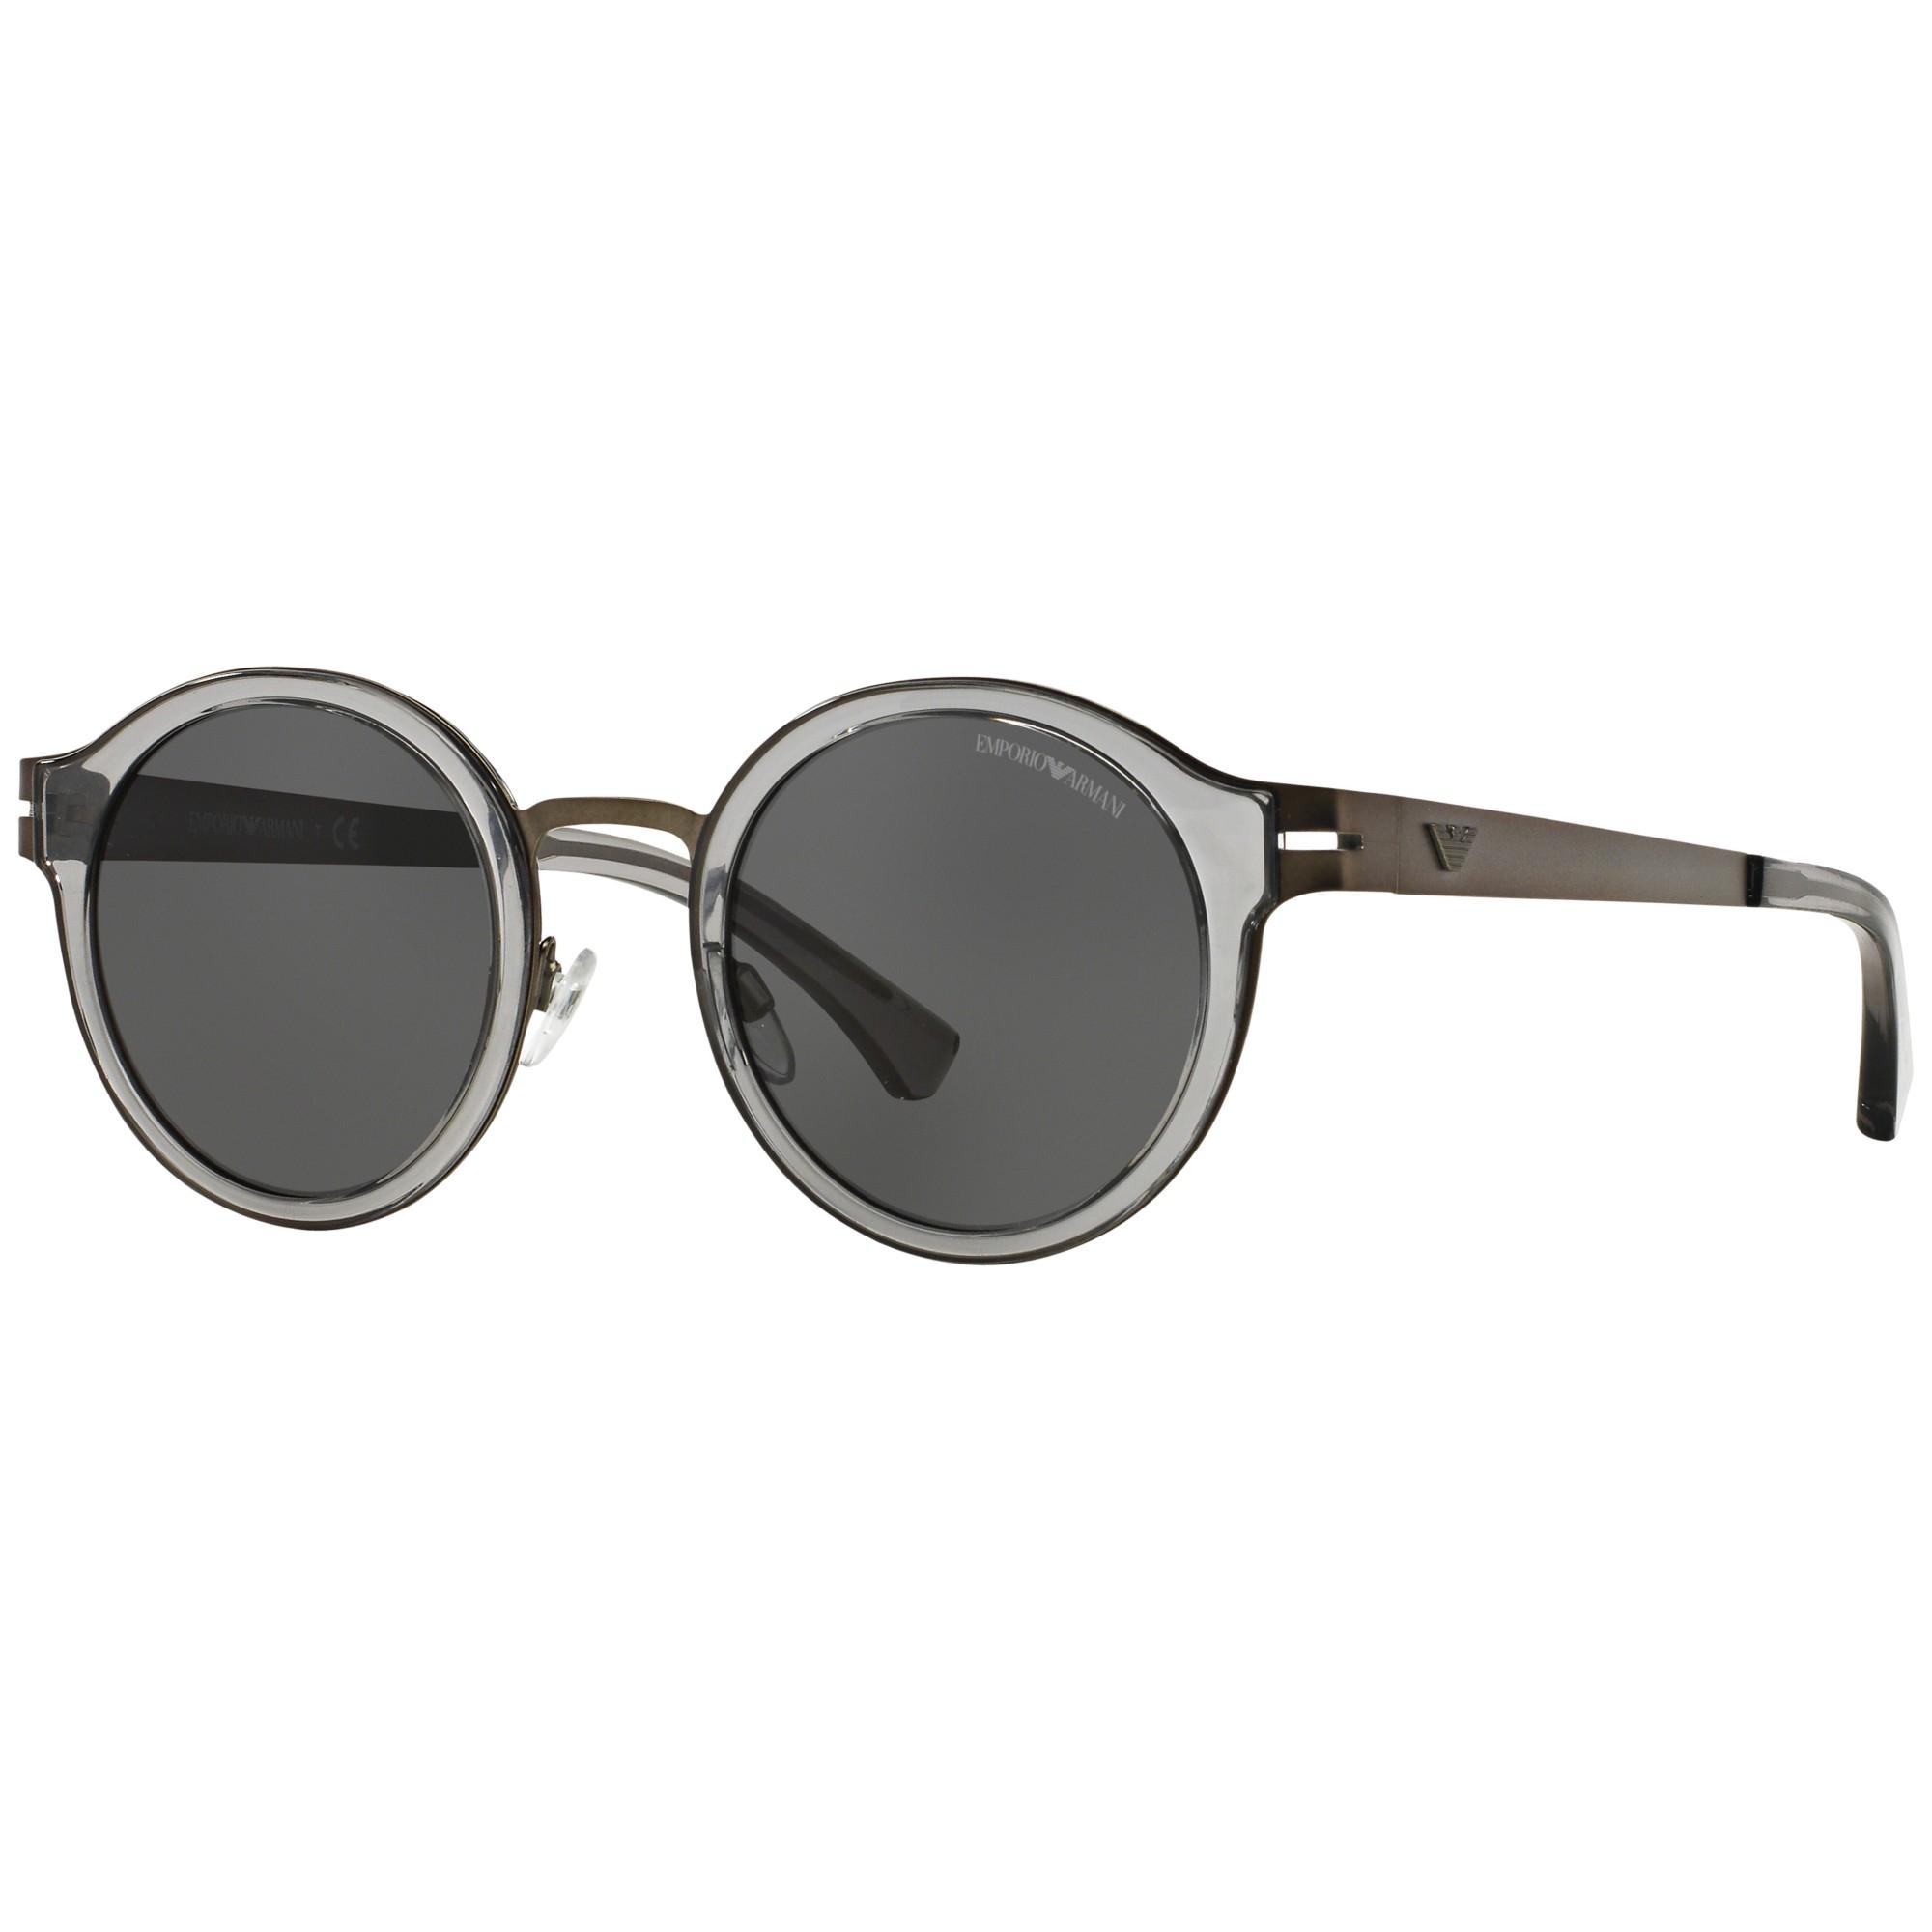 a391ac5ee3d5 Emporio Armani Ea2029 Round Sunglasses in Black - Lyst